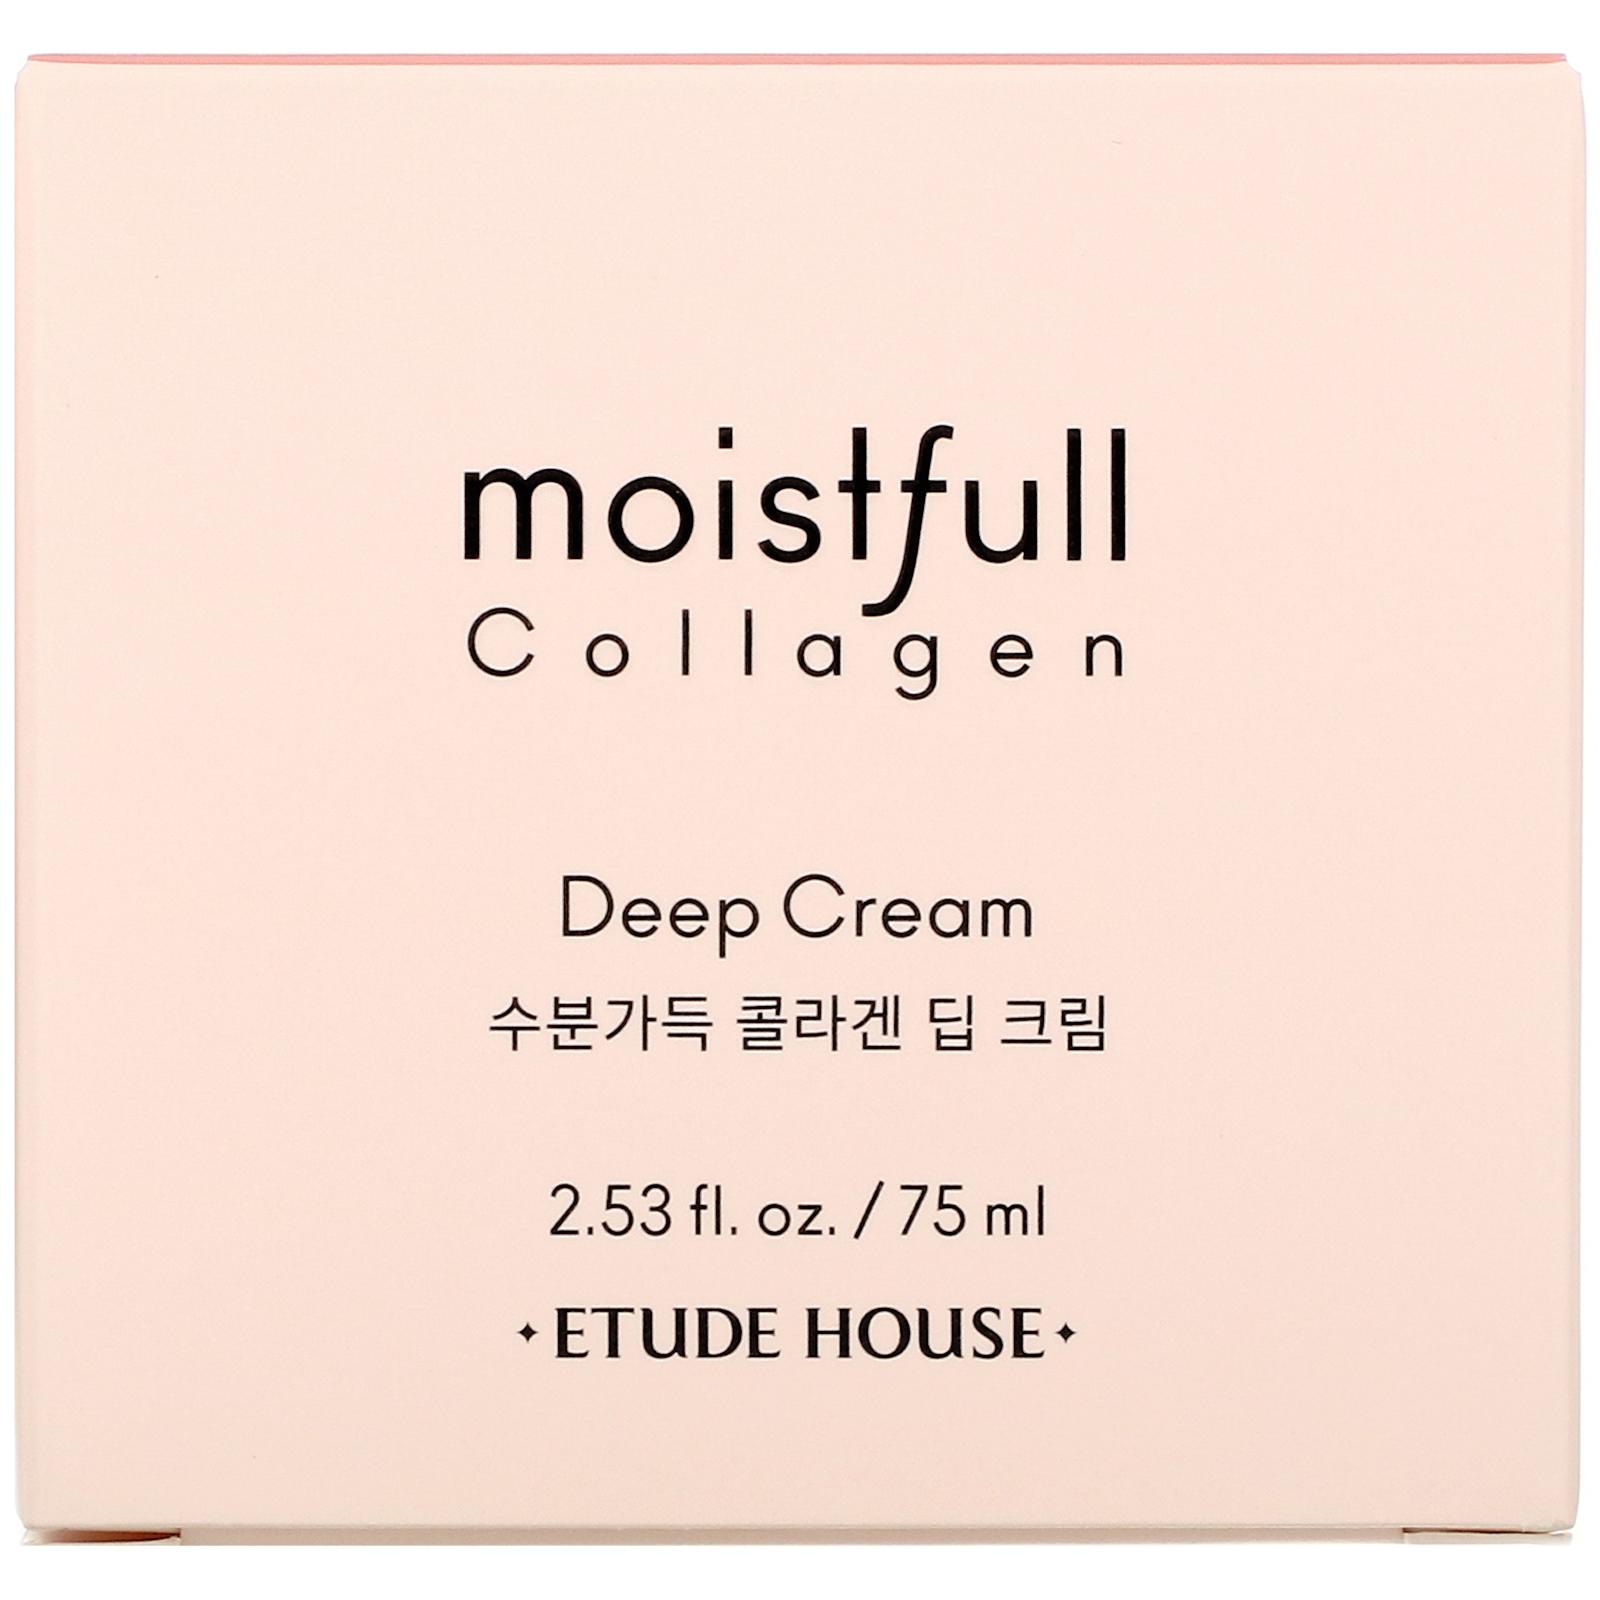 Etude House, Moistfull Collagen, Deep Cream, 2.53 fl oz (75 ml)